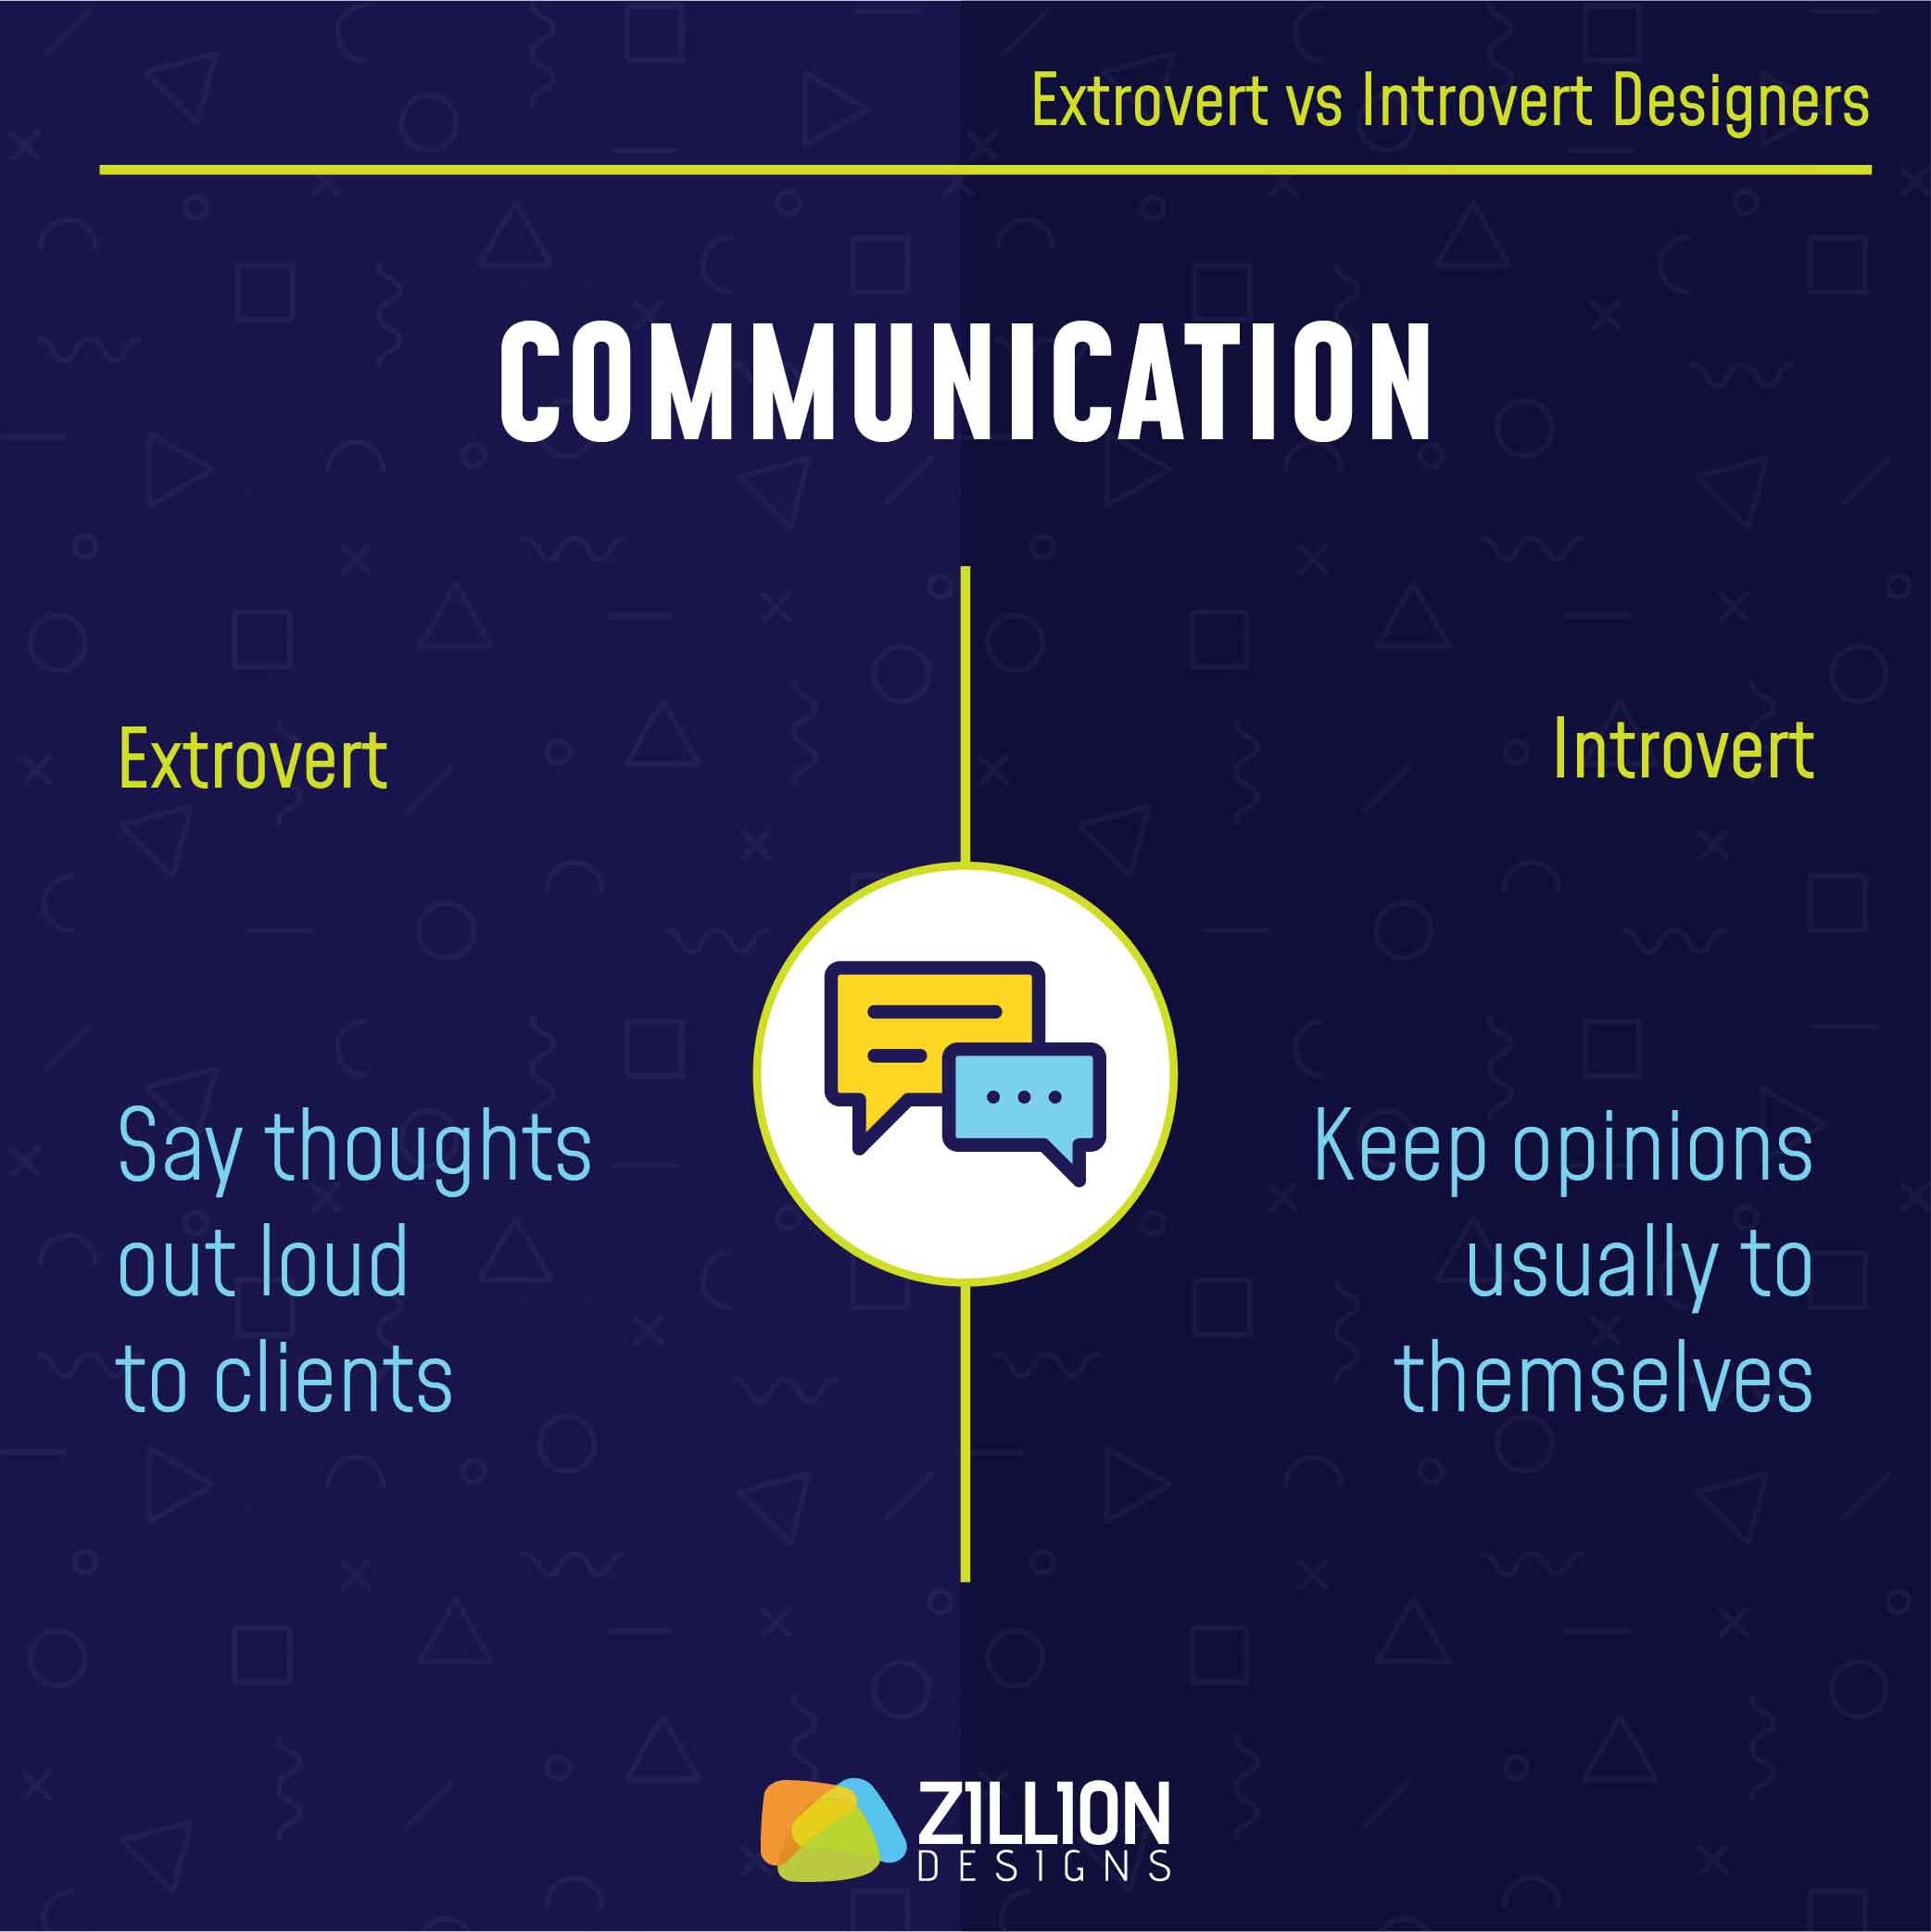 Extrovert vs Introvert Designers 3